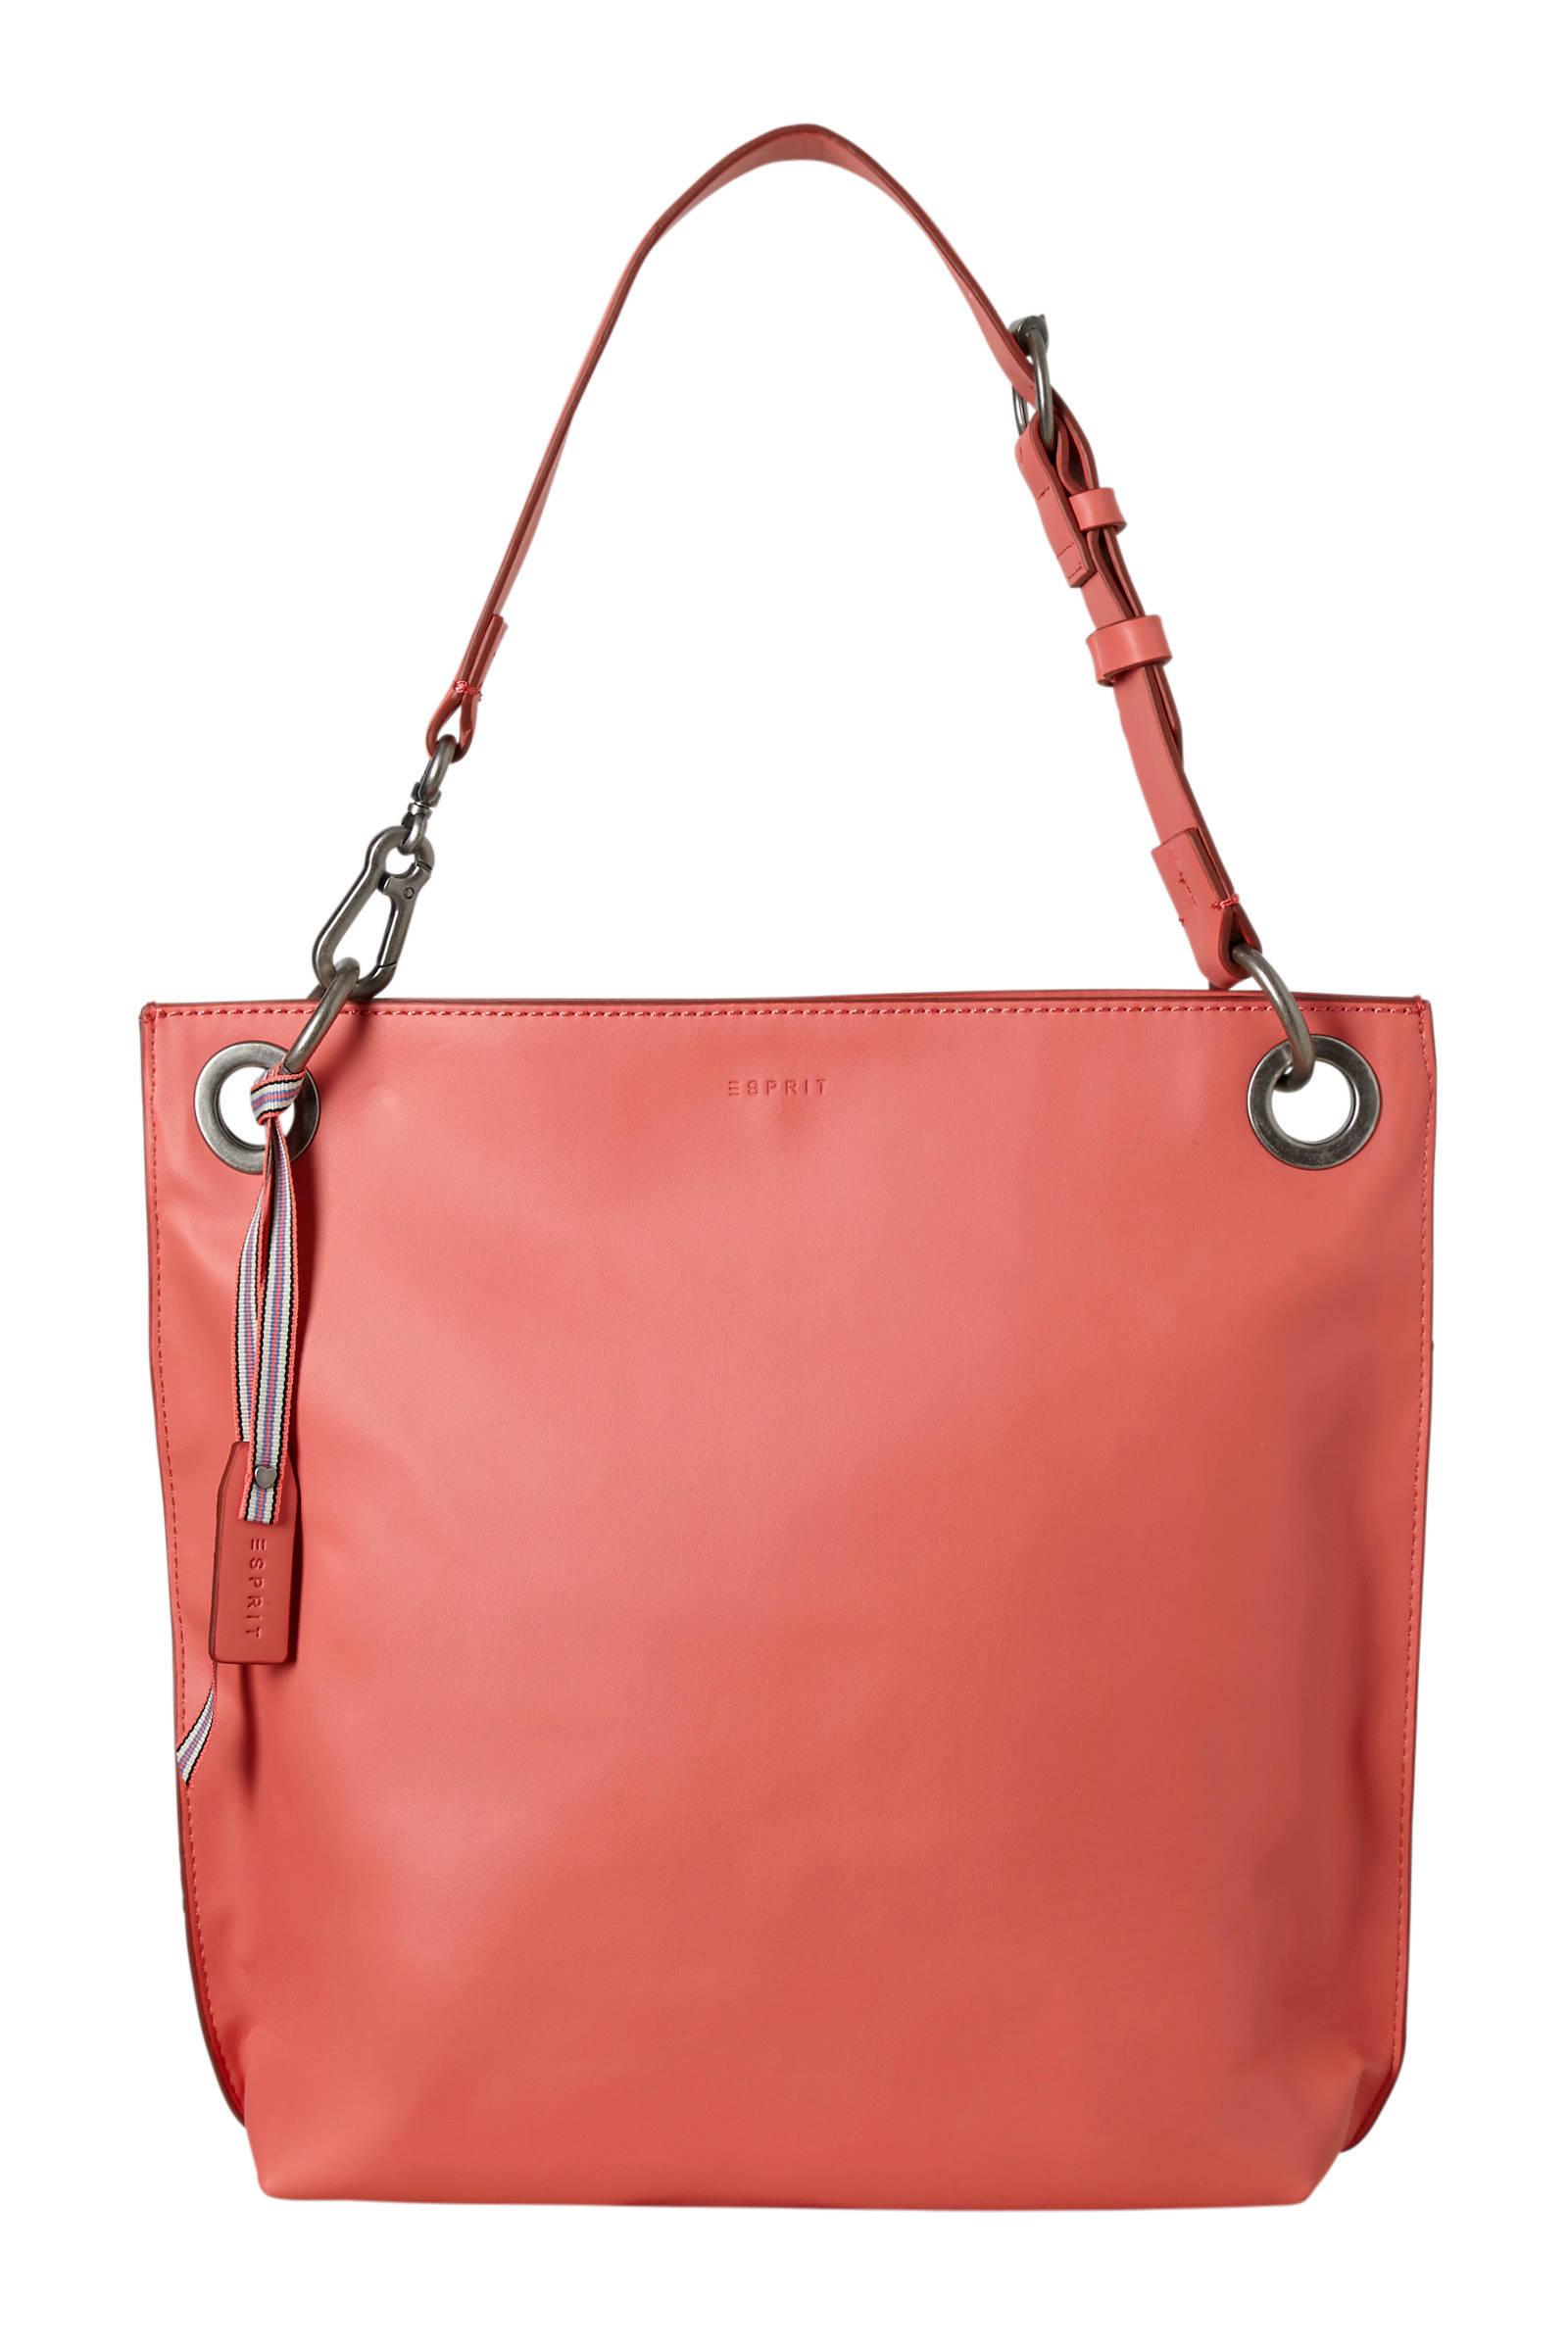 482e09e46f7 National Glamour Day accessoires bij wehkamp - Gratis bezorging vanaf 20.-